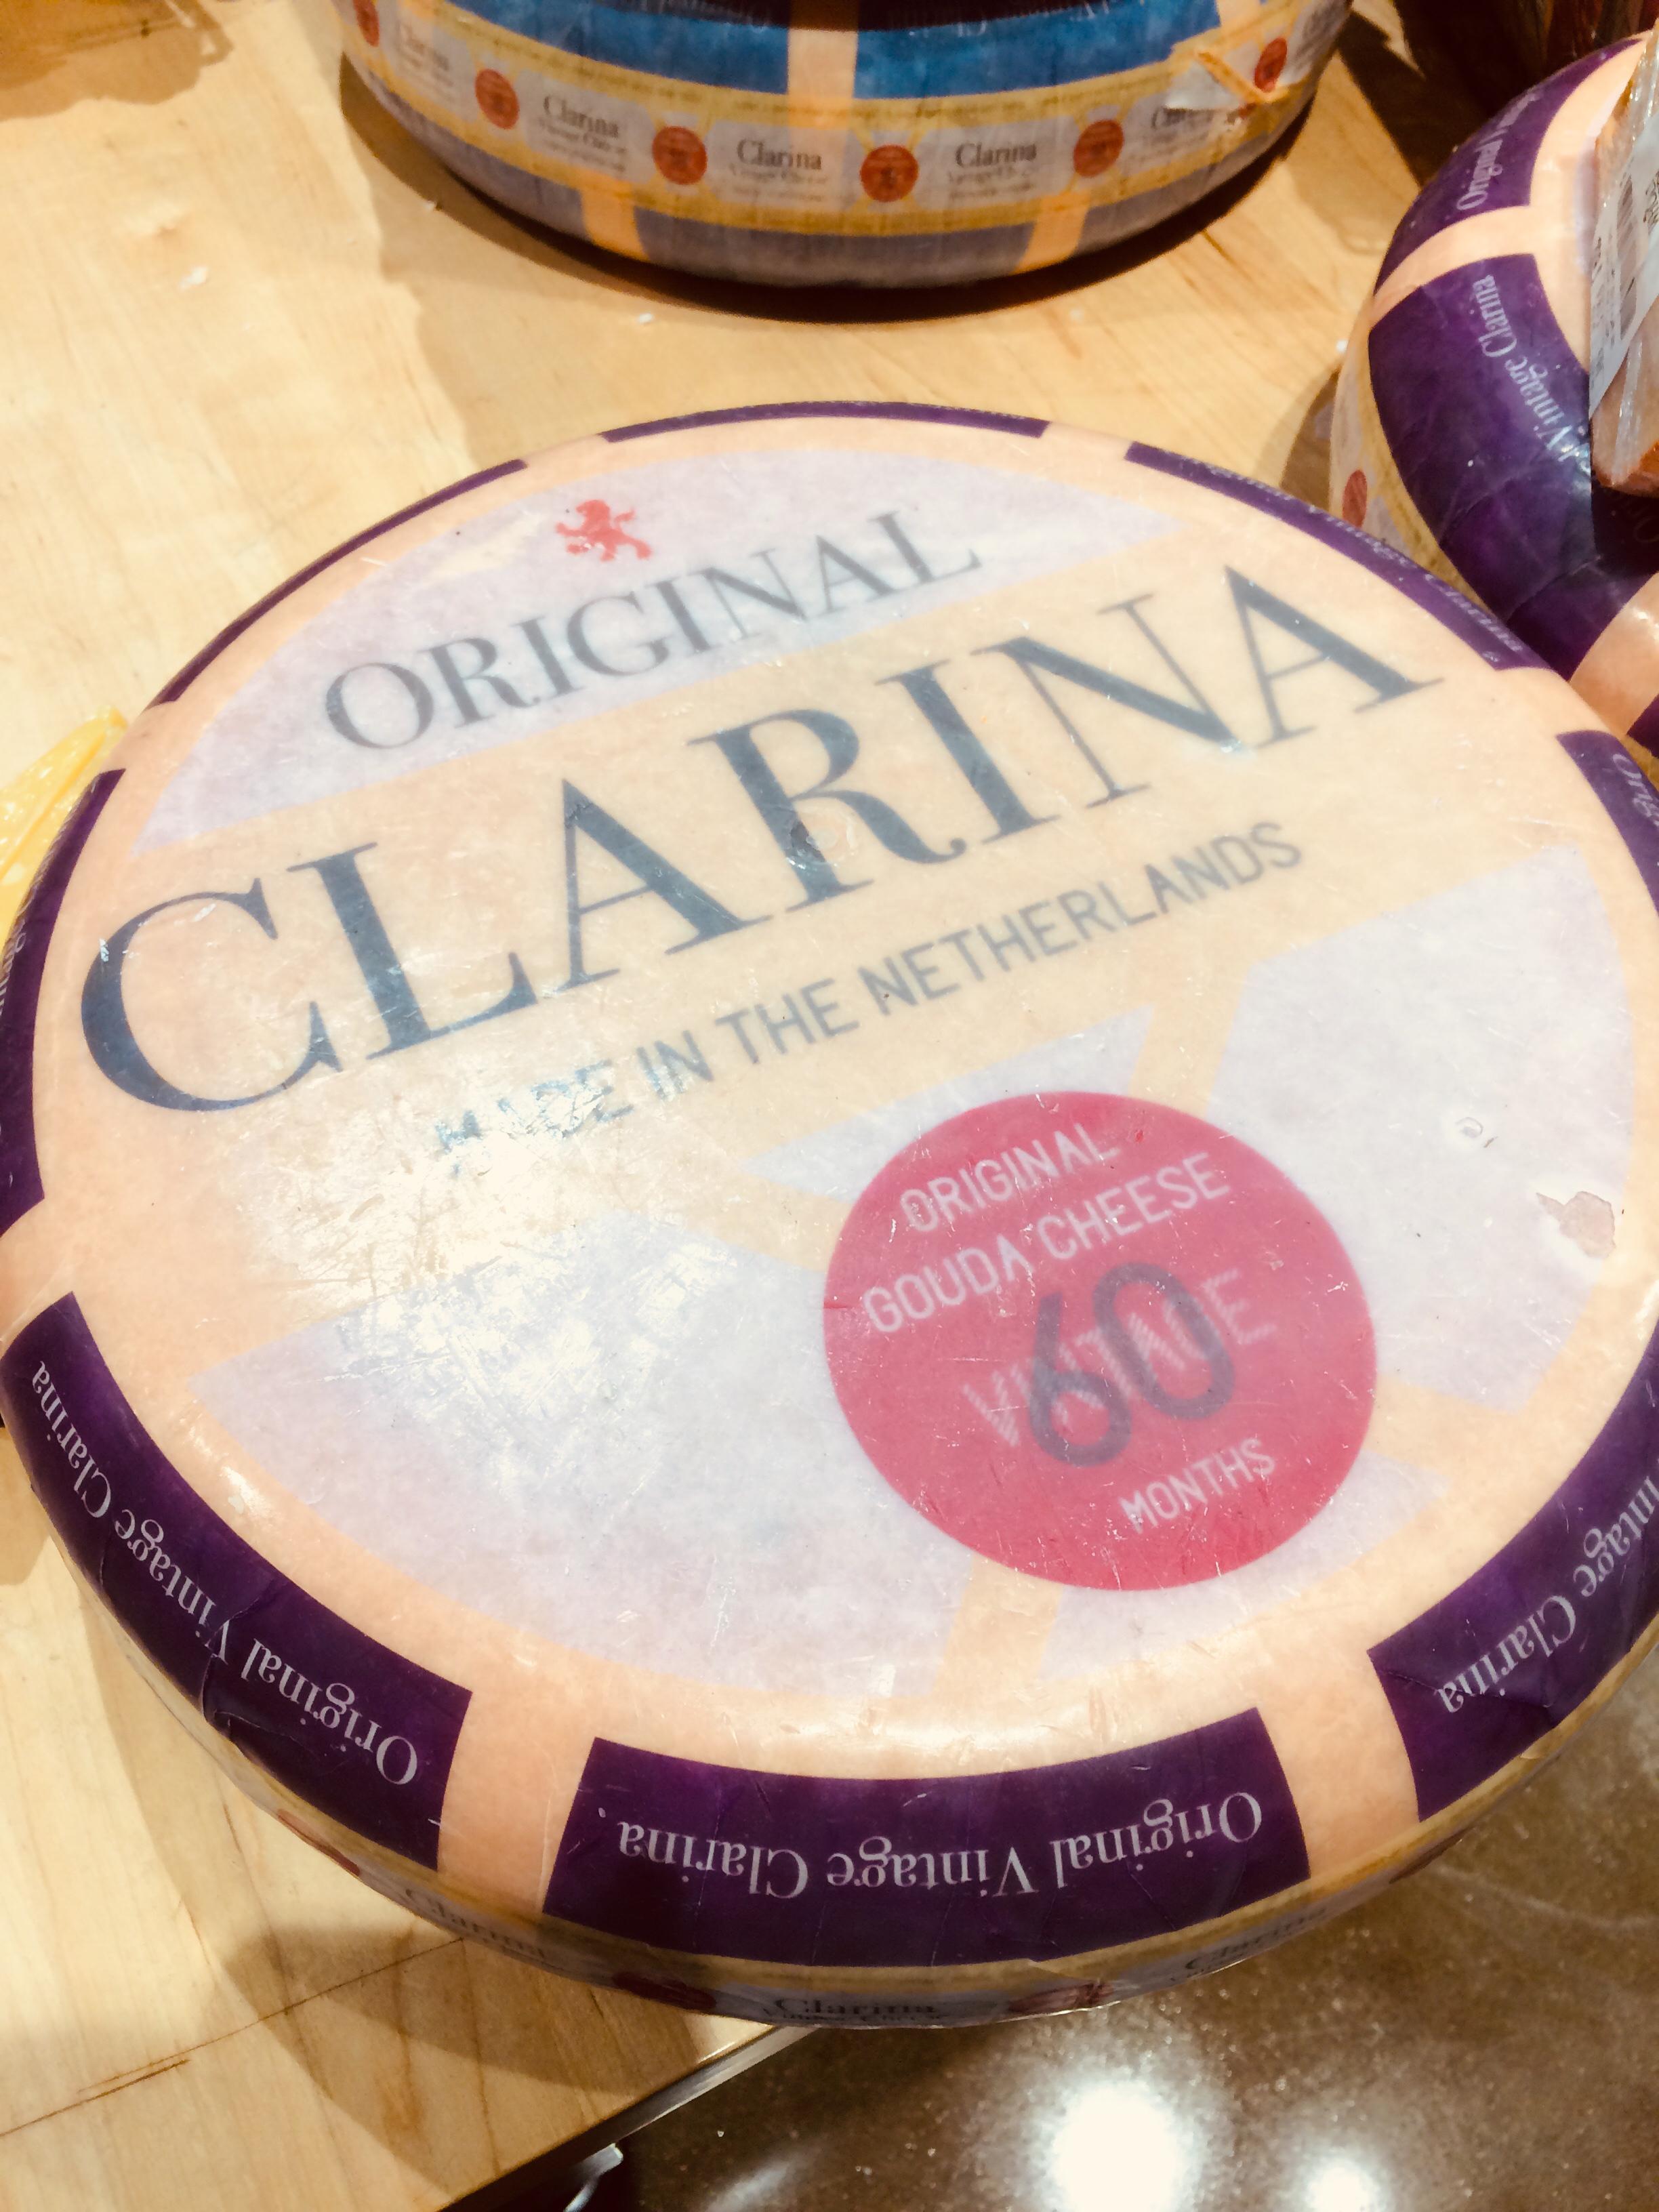 Clarina Gouda 60 months